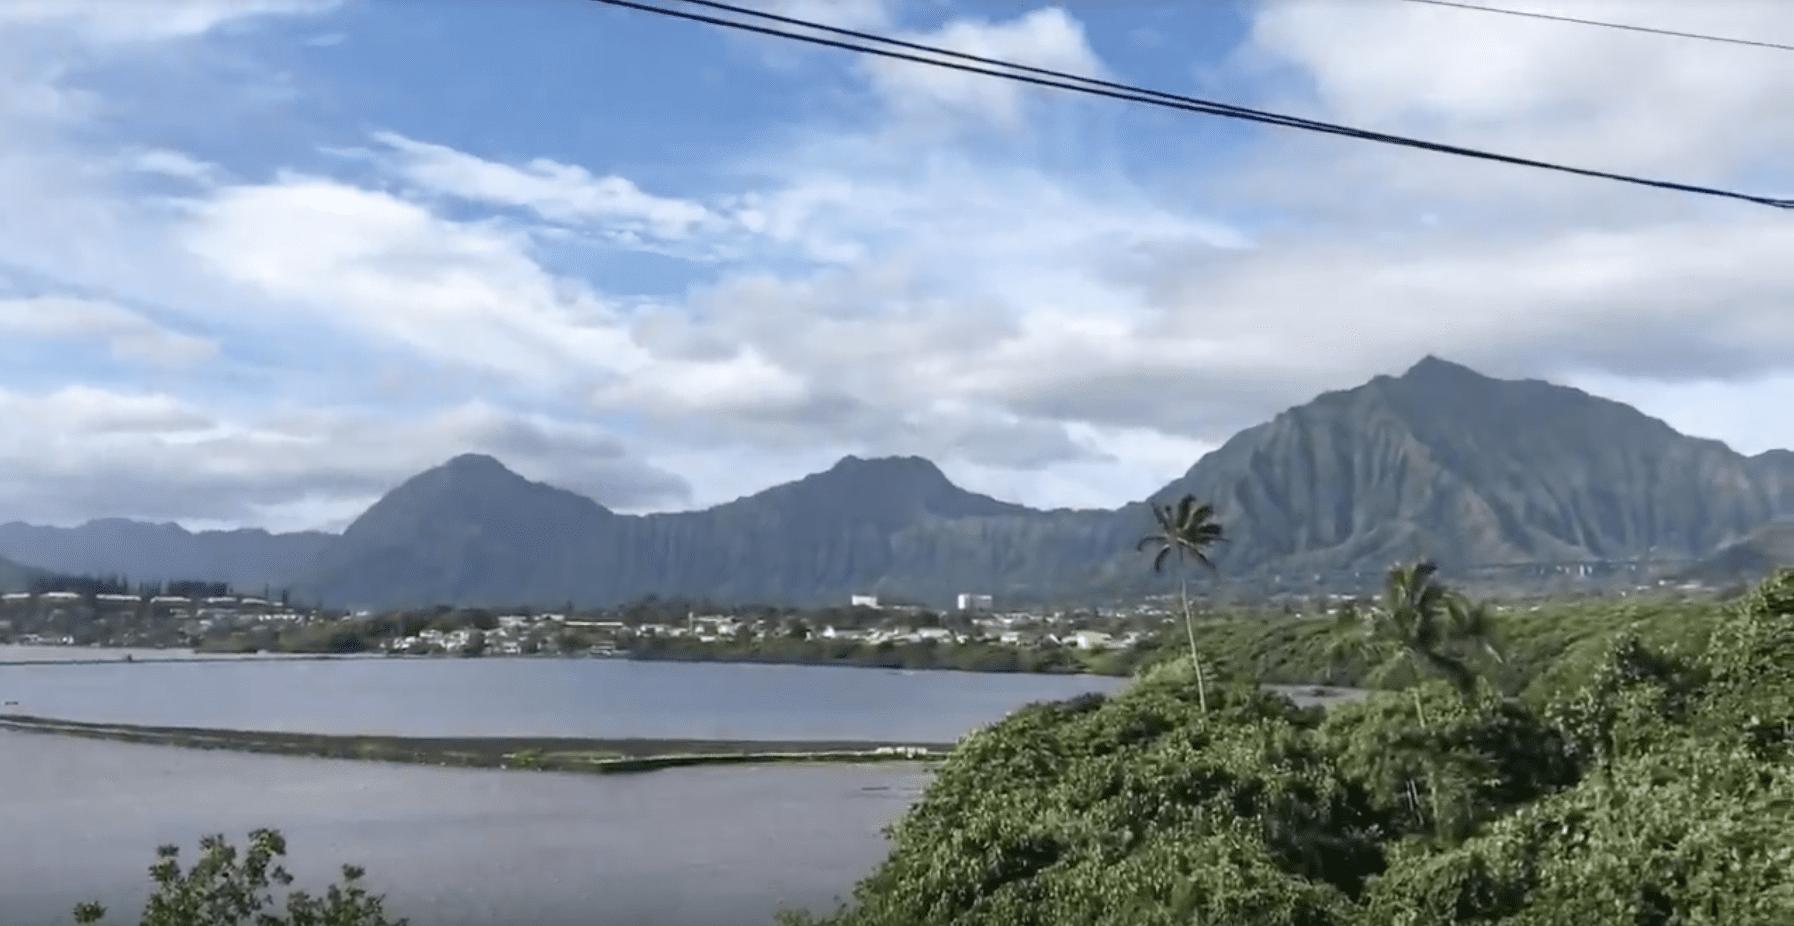 su18_intern in hawai'i_katherine kirchner